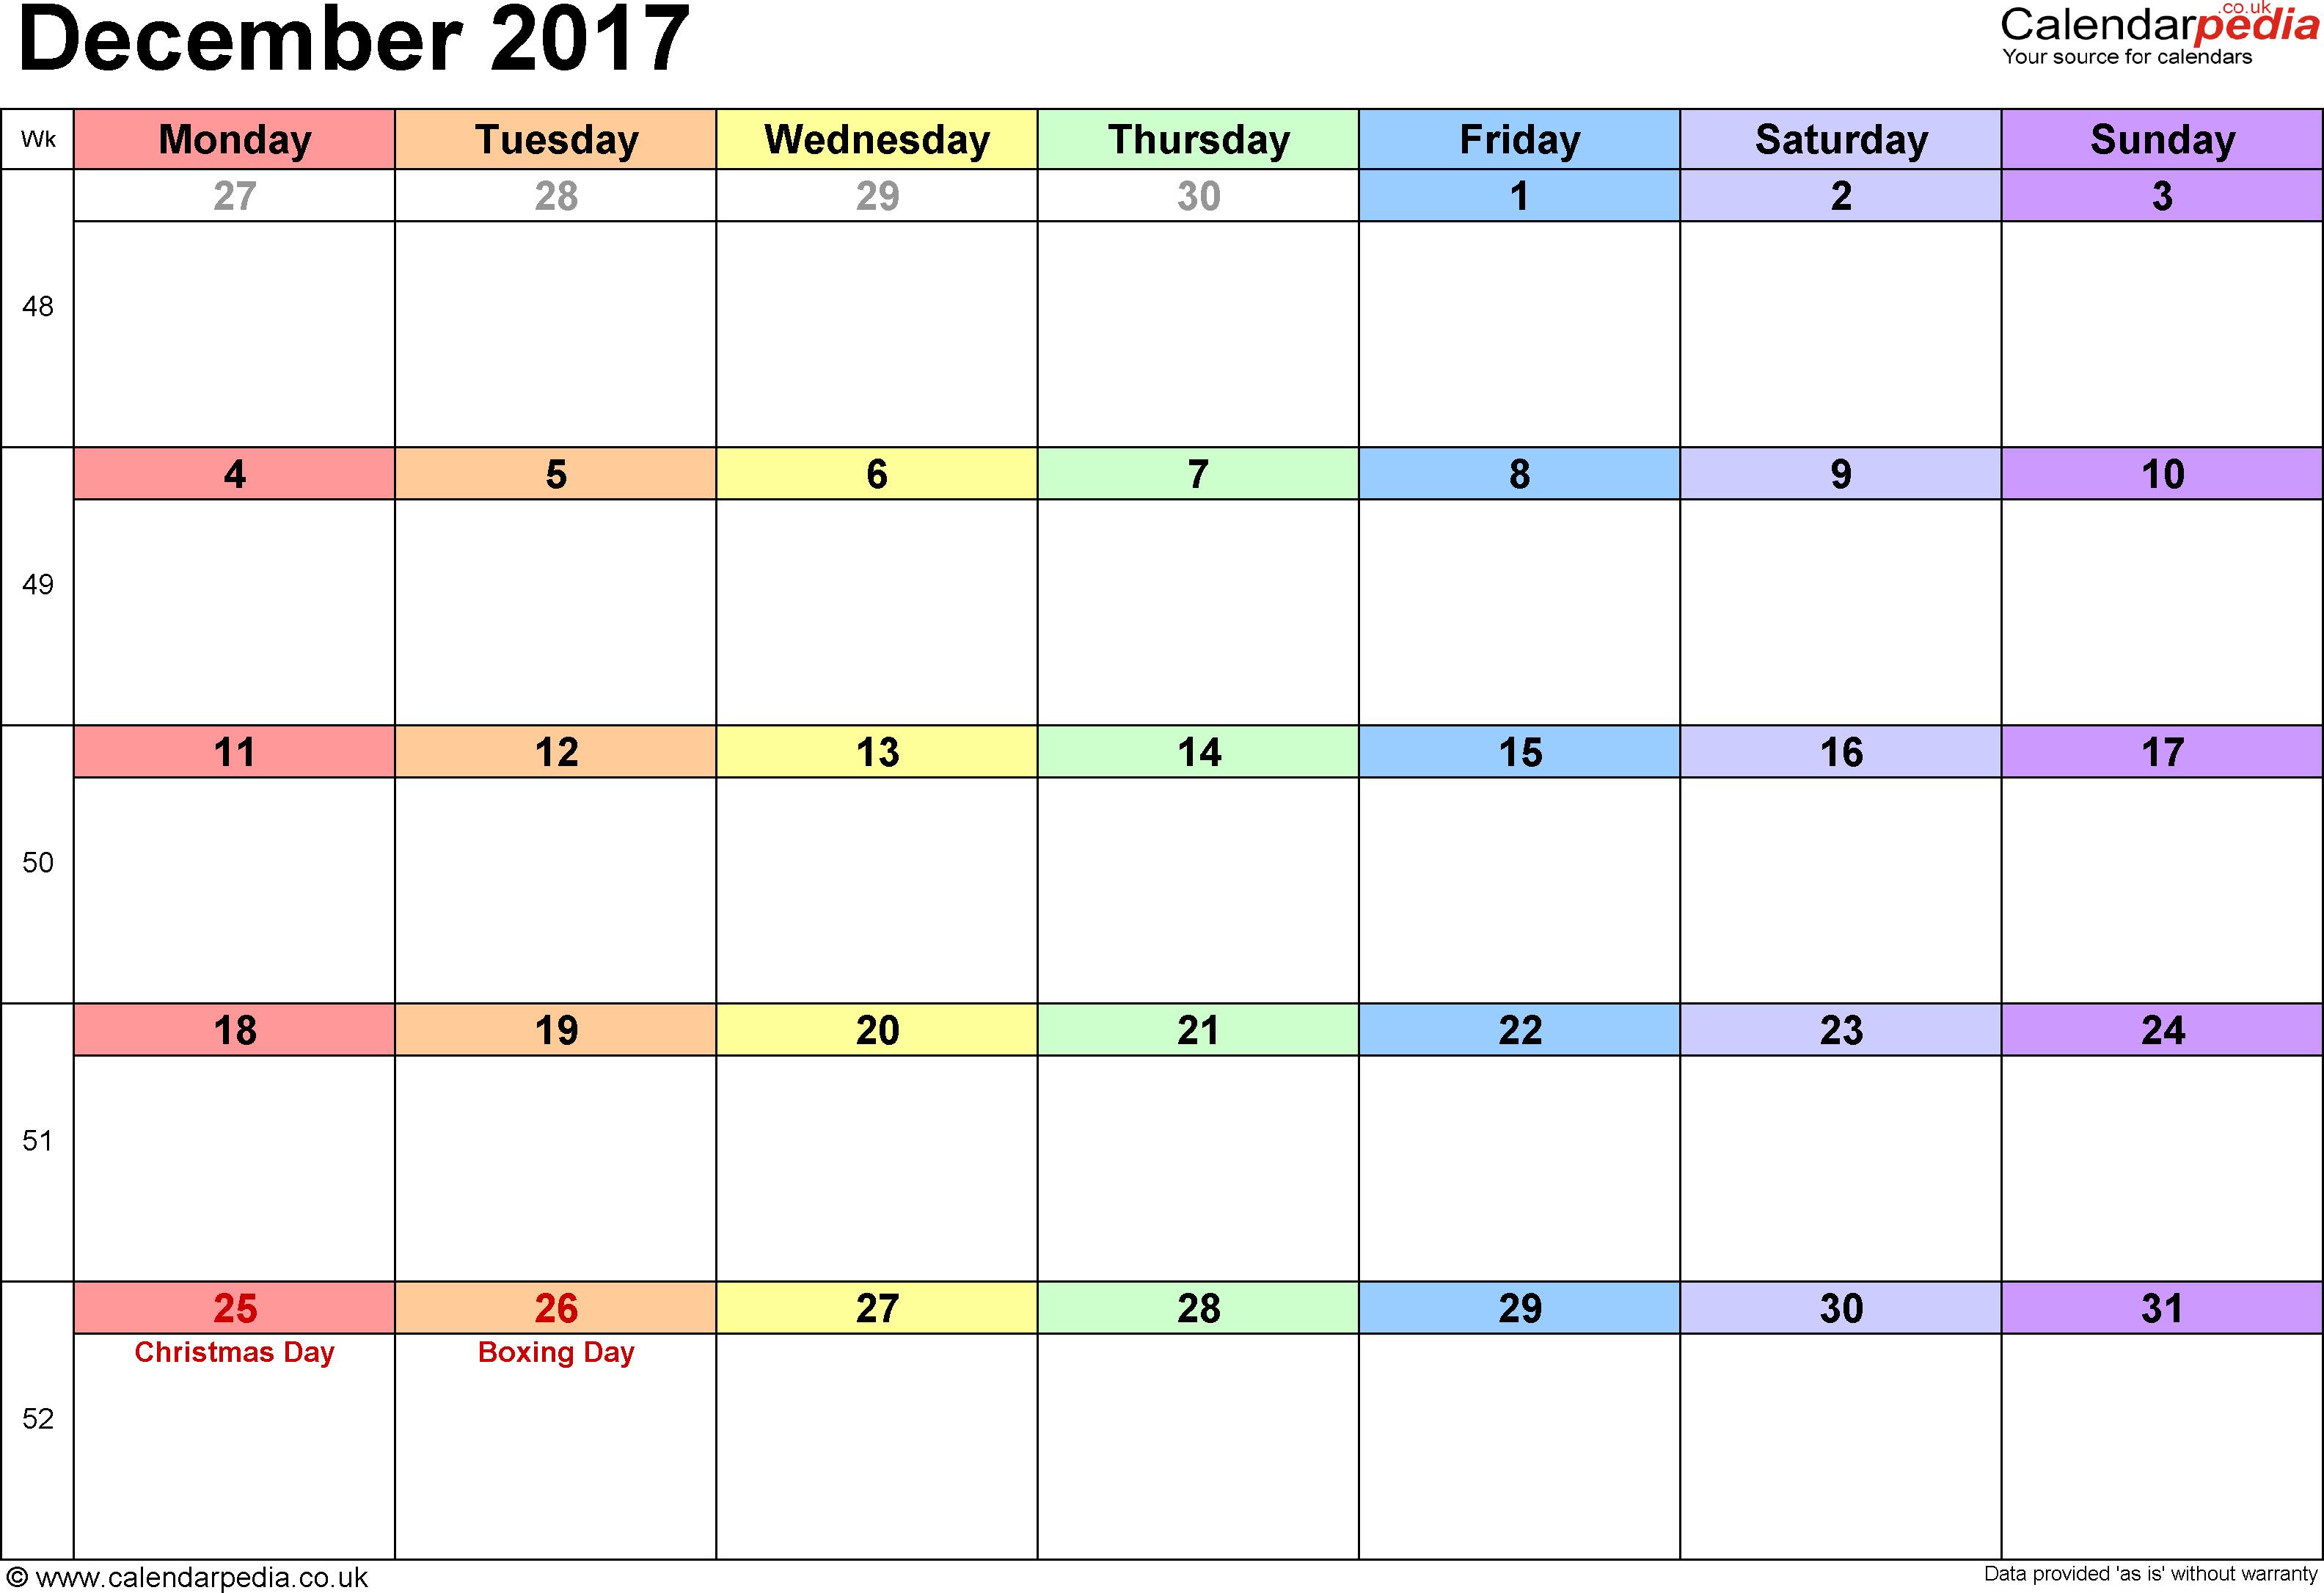 Calendar December 2017 UK, Bank Holidays, Excel/PDF/Word Templates